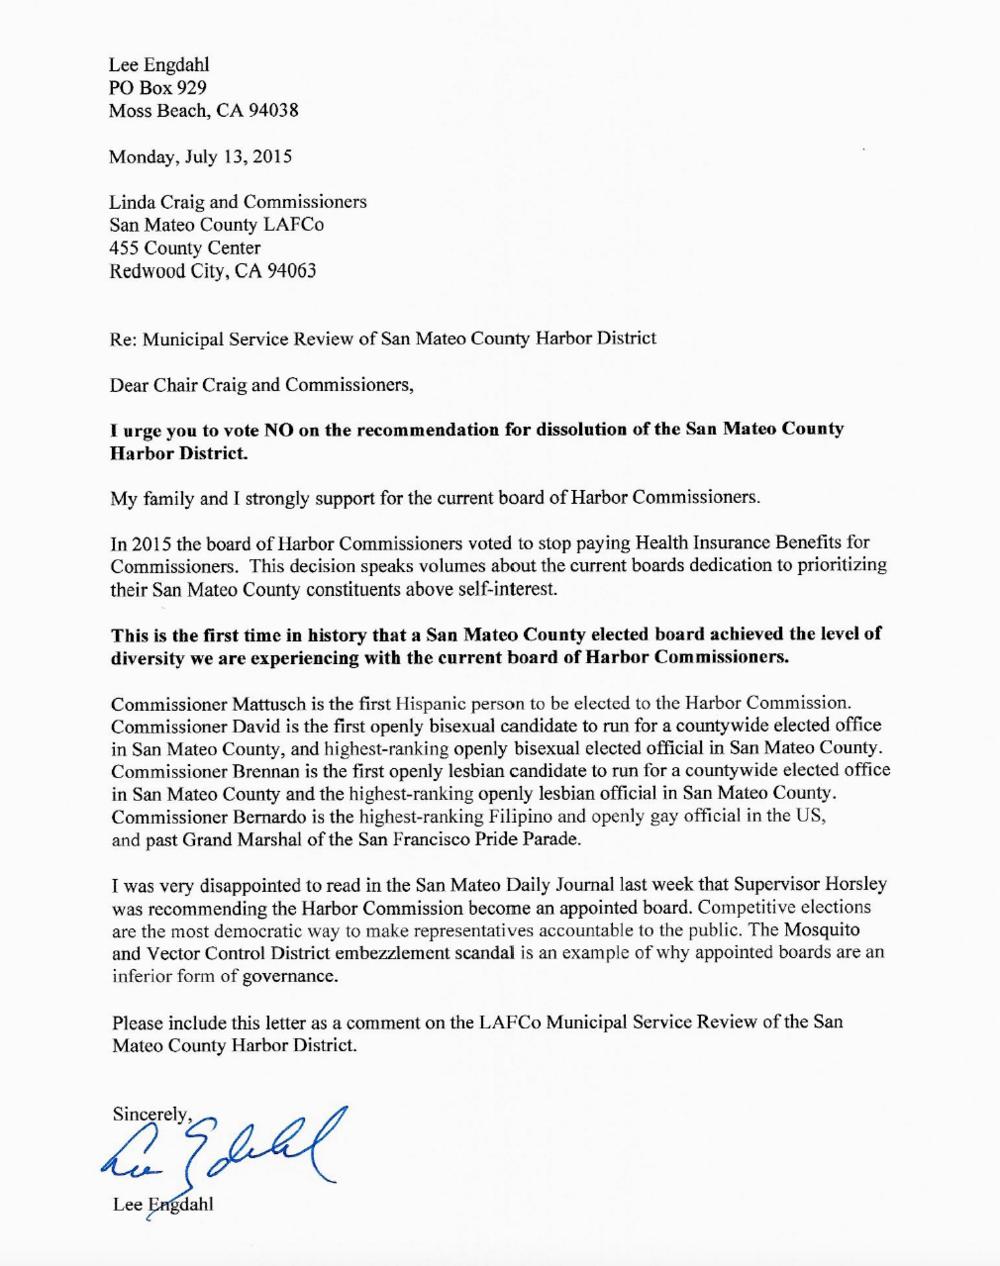 Lee Engdahl Letter SMC LAFCo